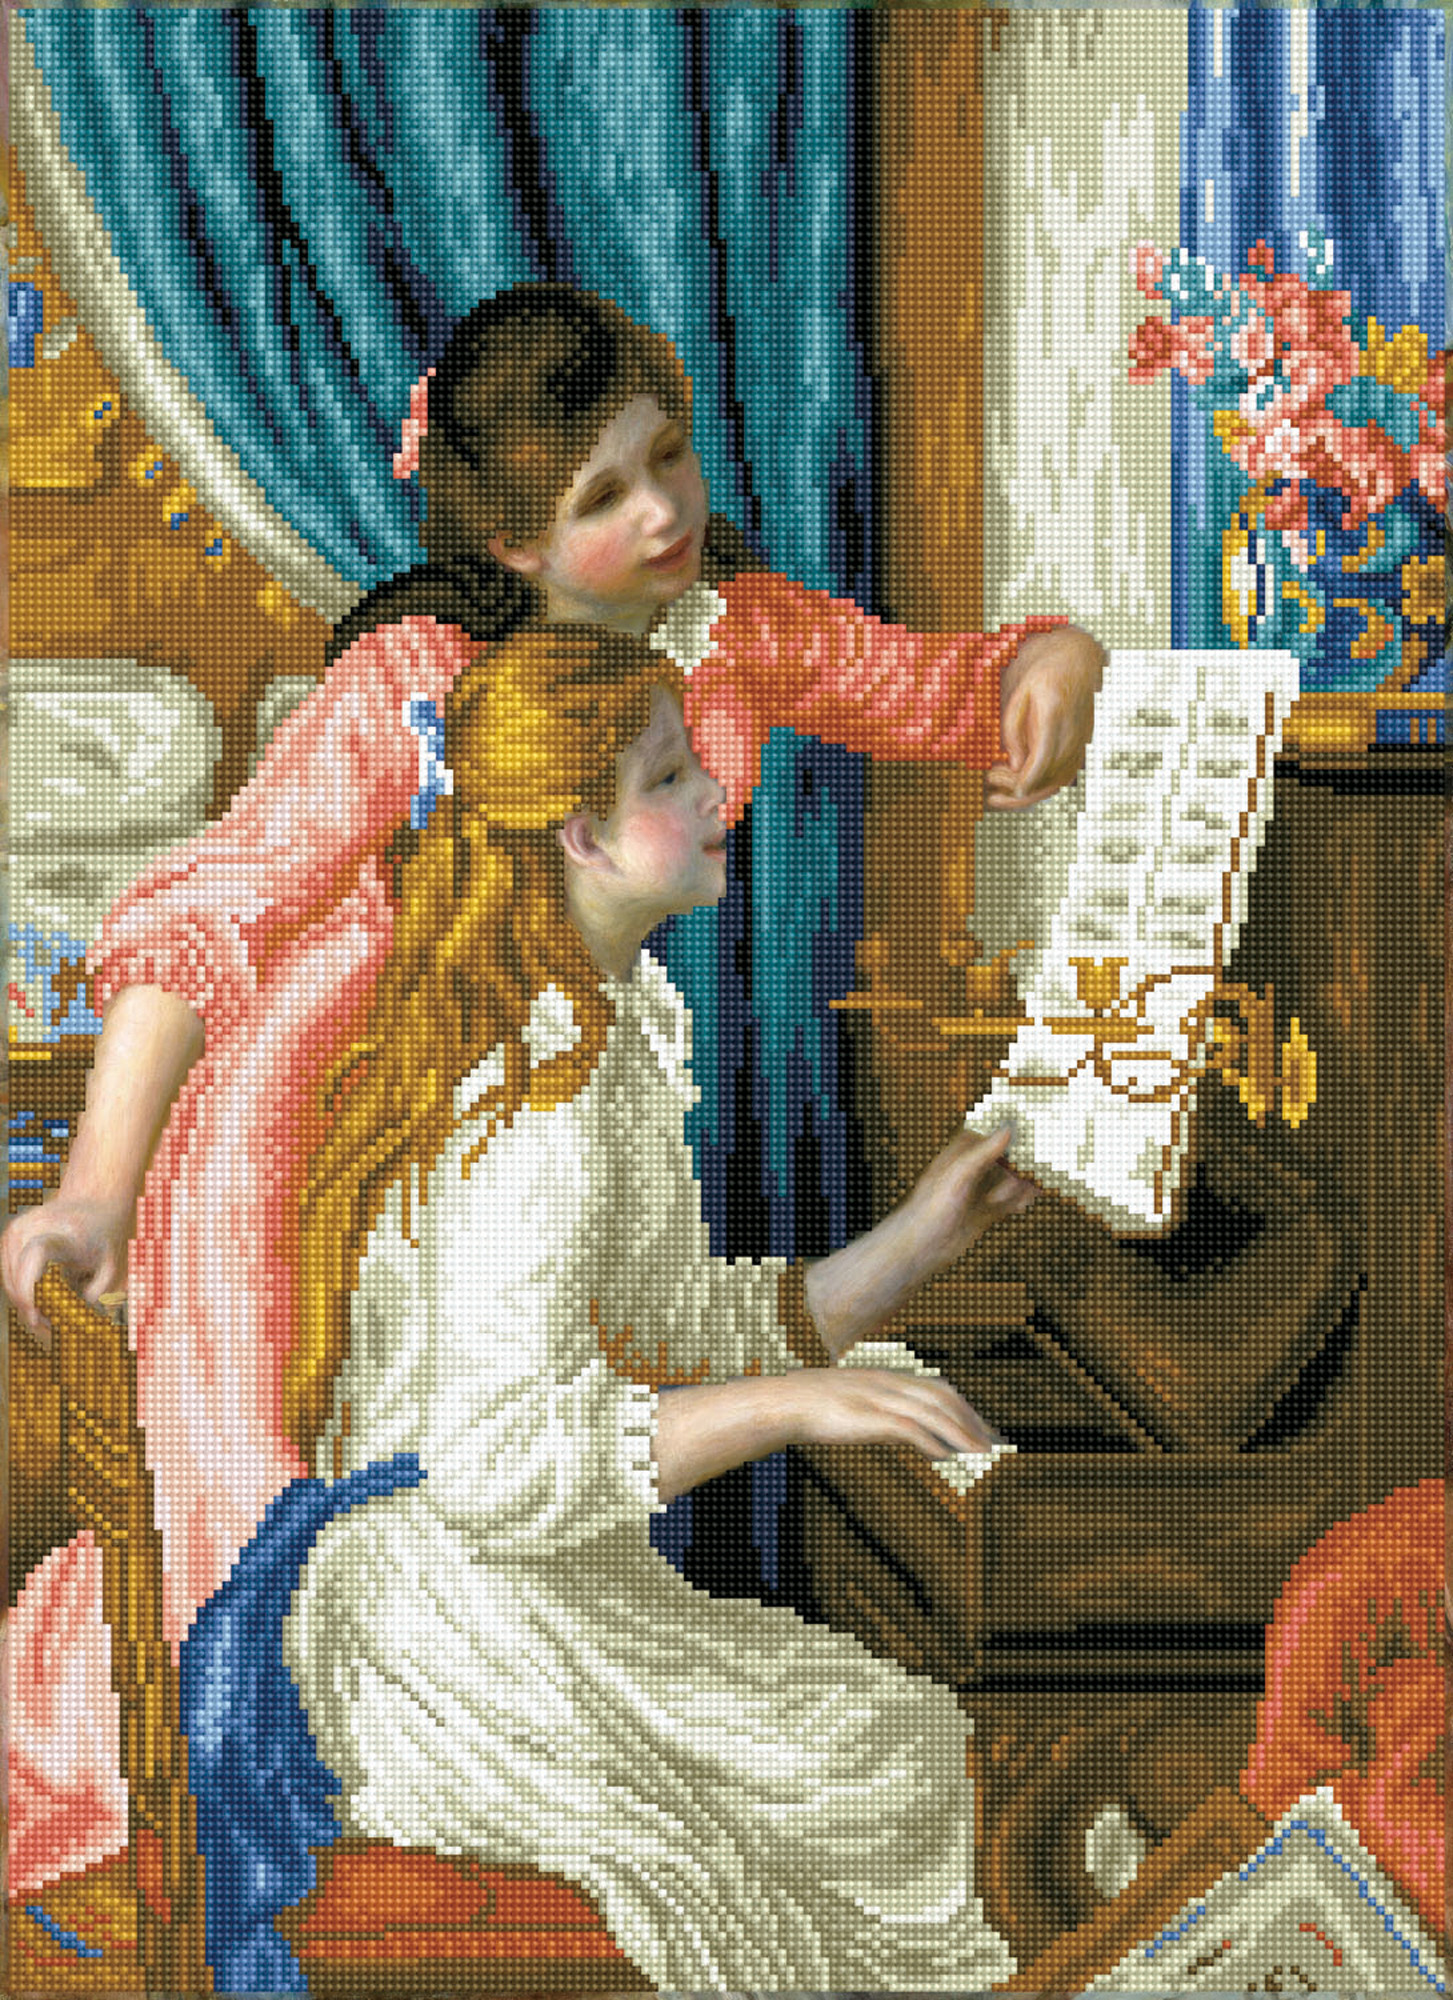 Tablou cu diamante - Fete la pian (Renoir), 66 x 48 cm imagine edituradiana.ro